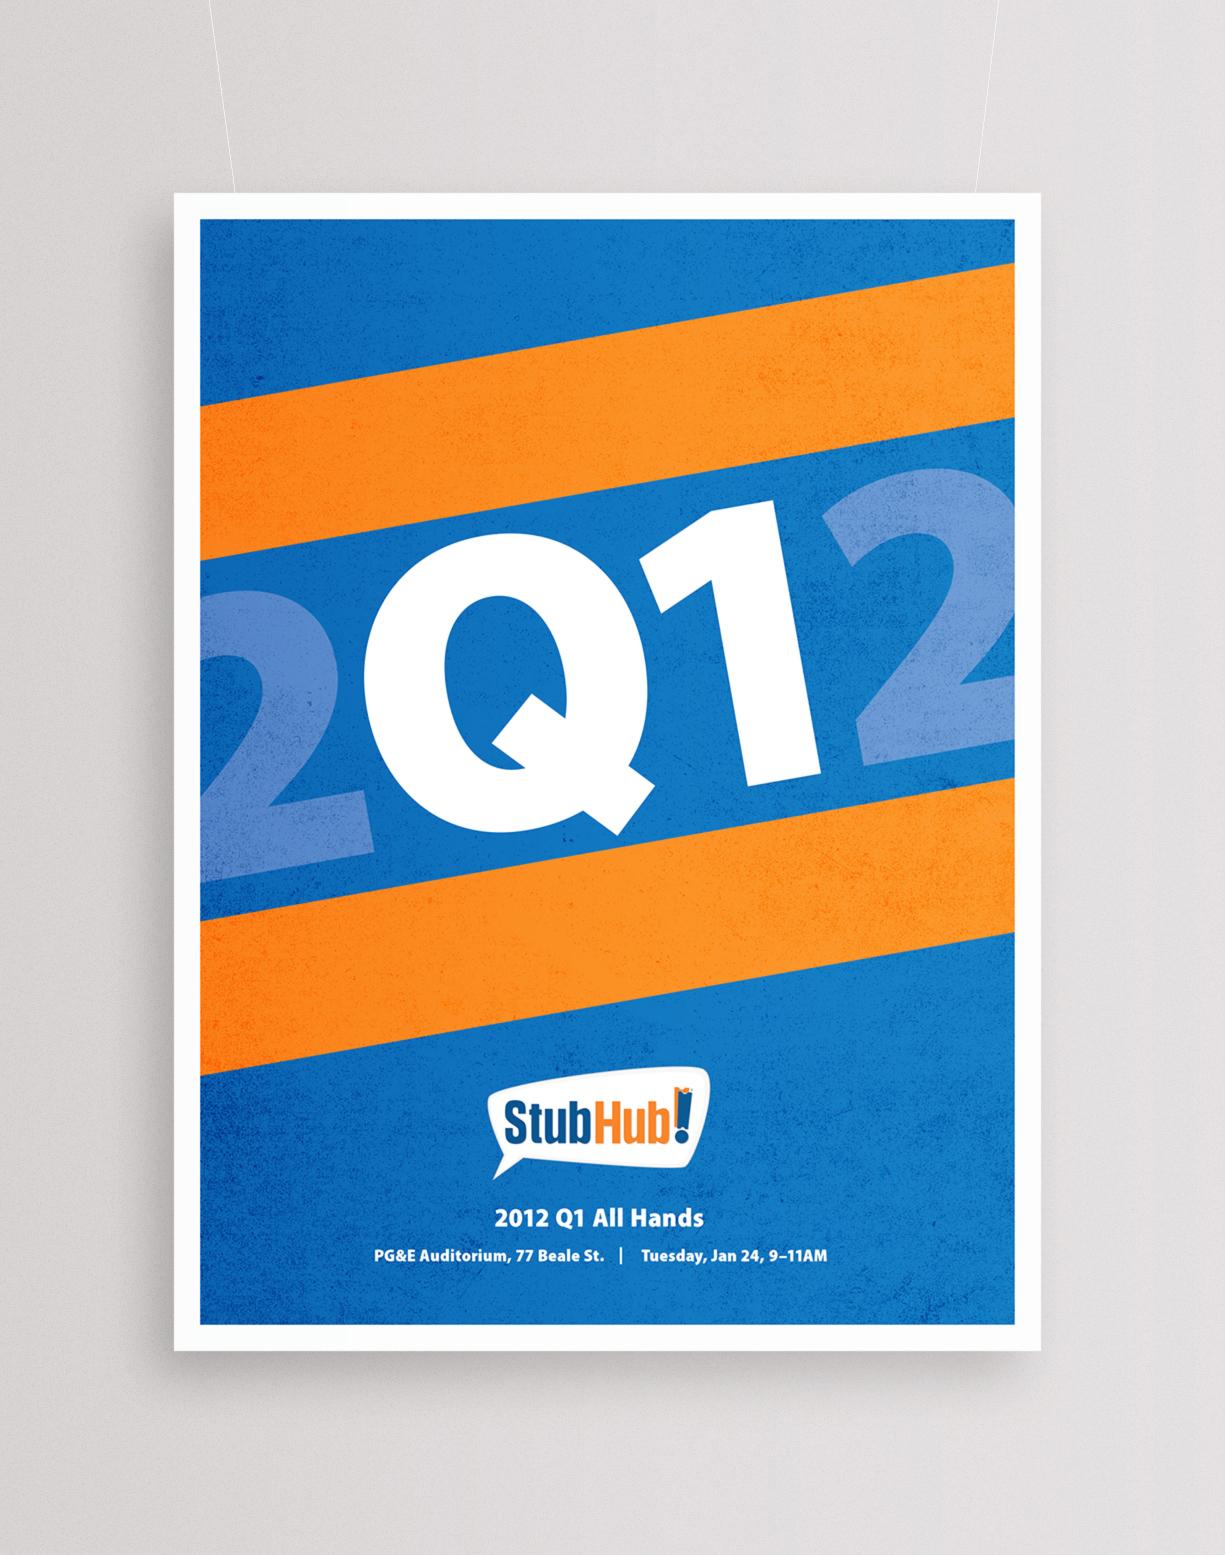 stubhub_2012-Q1_Poster.jpg